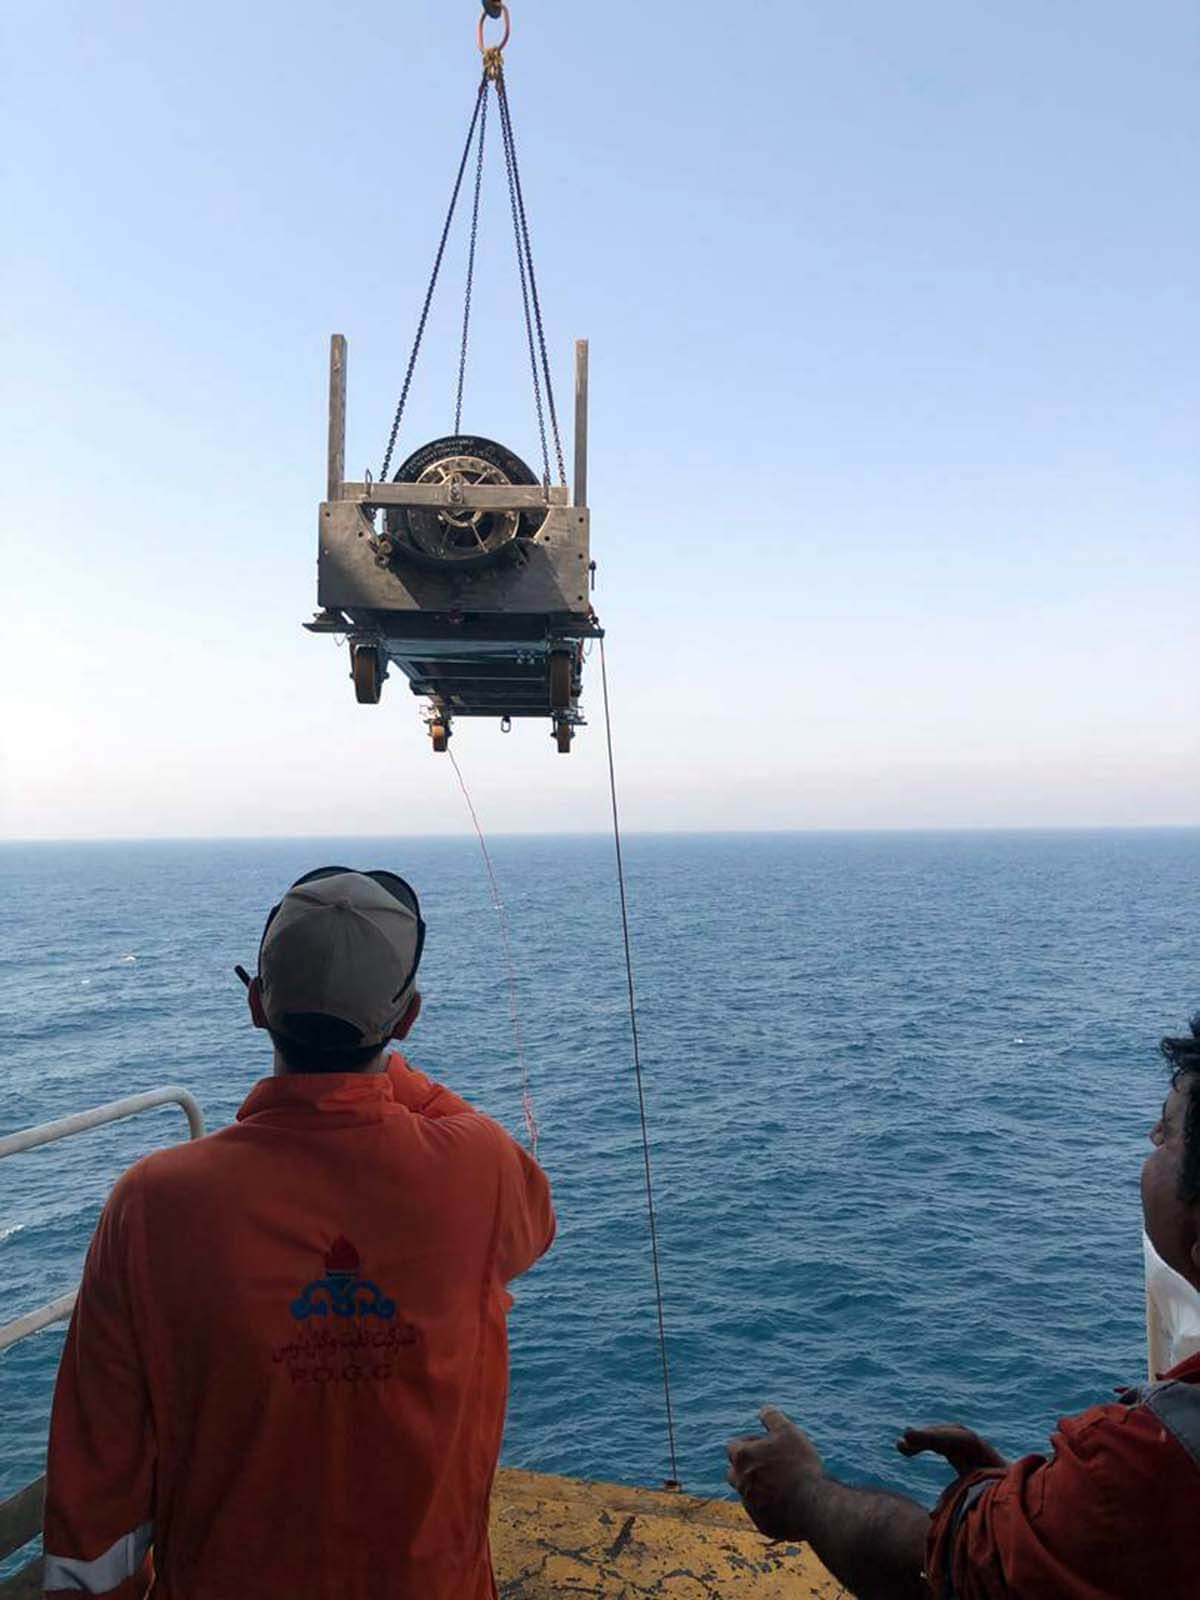 پیگرانی هوشمند خط لوله دریایی پارس جنوبی